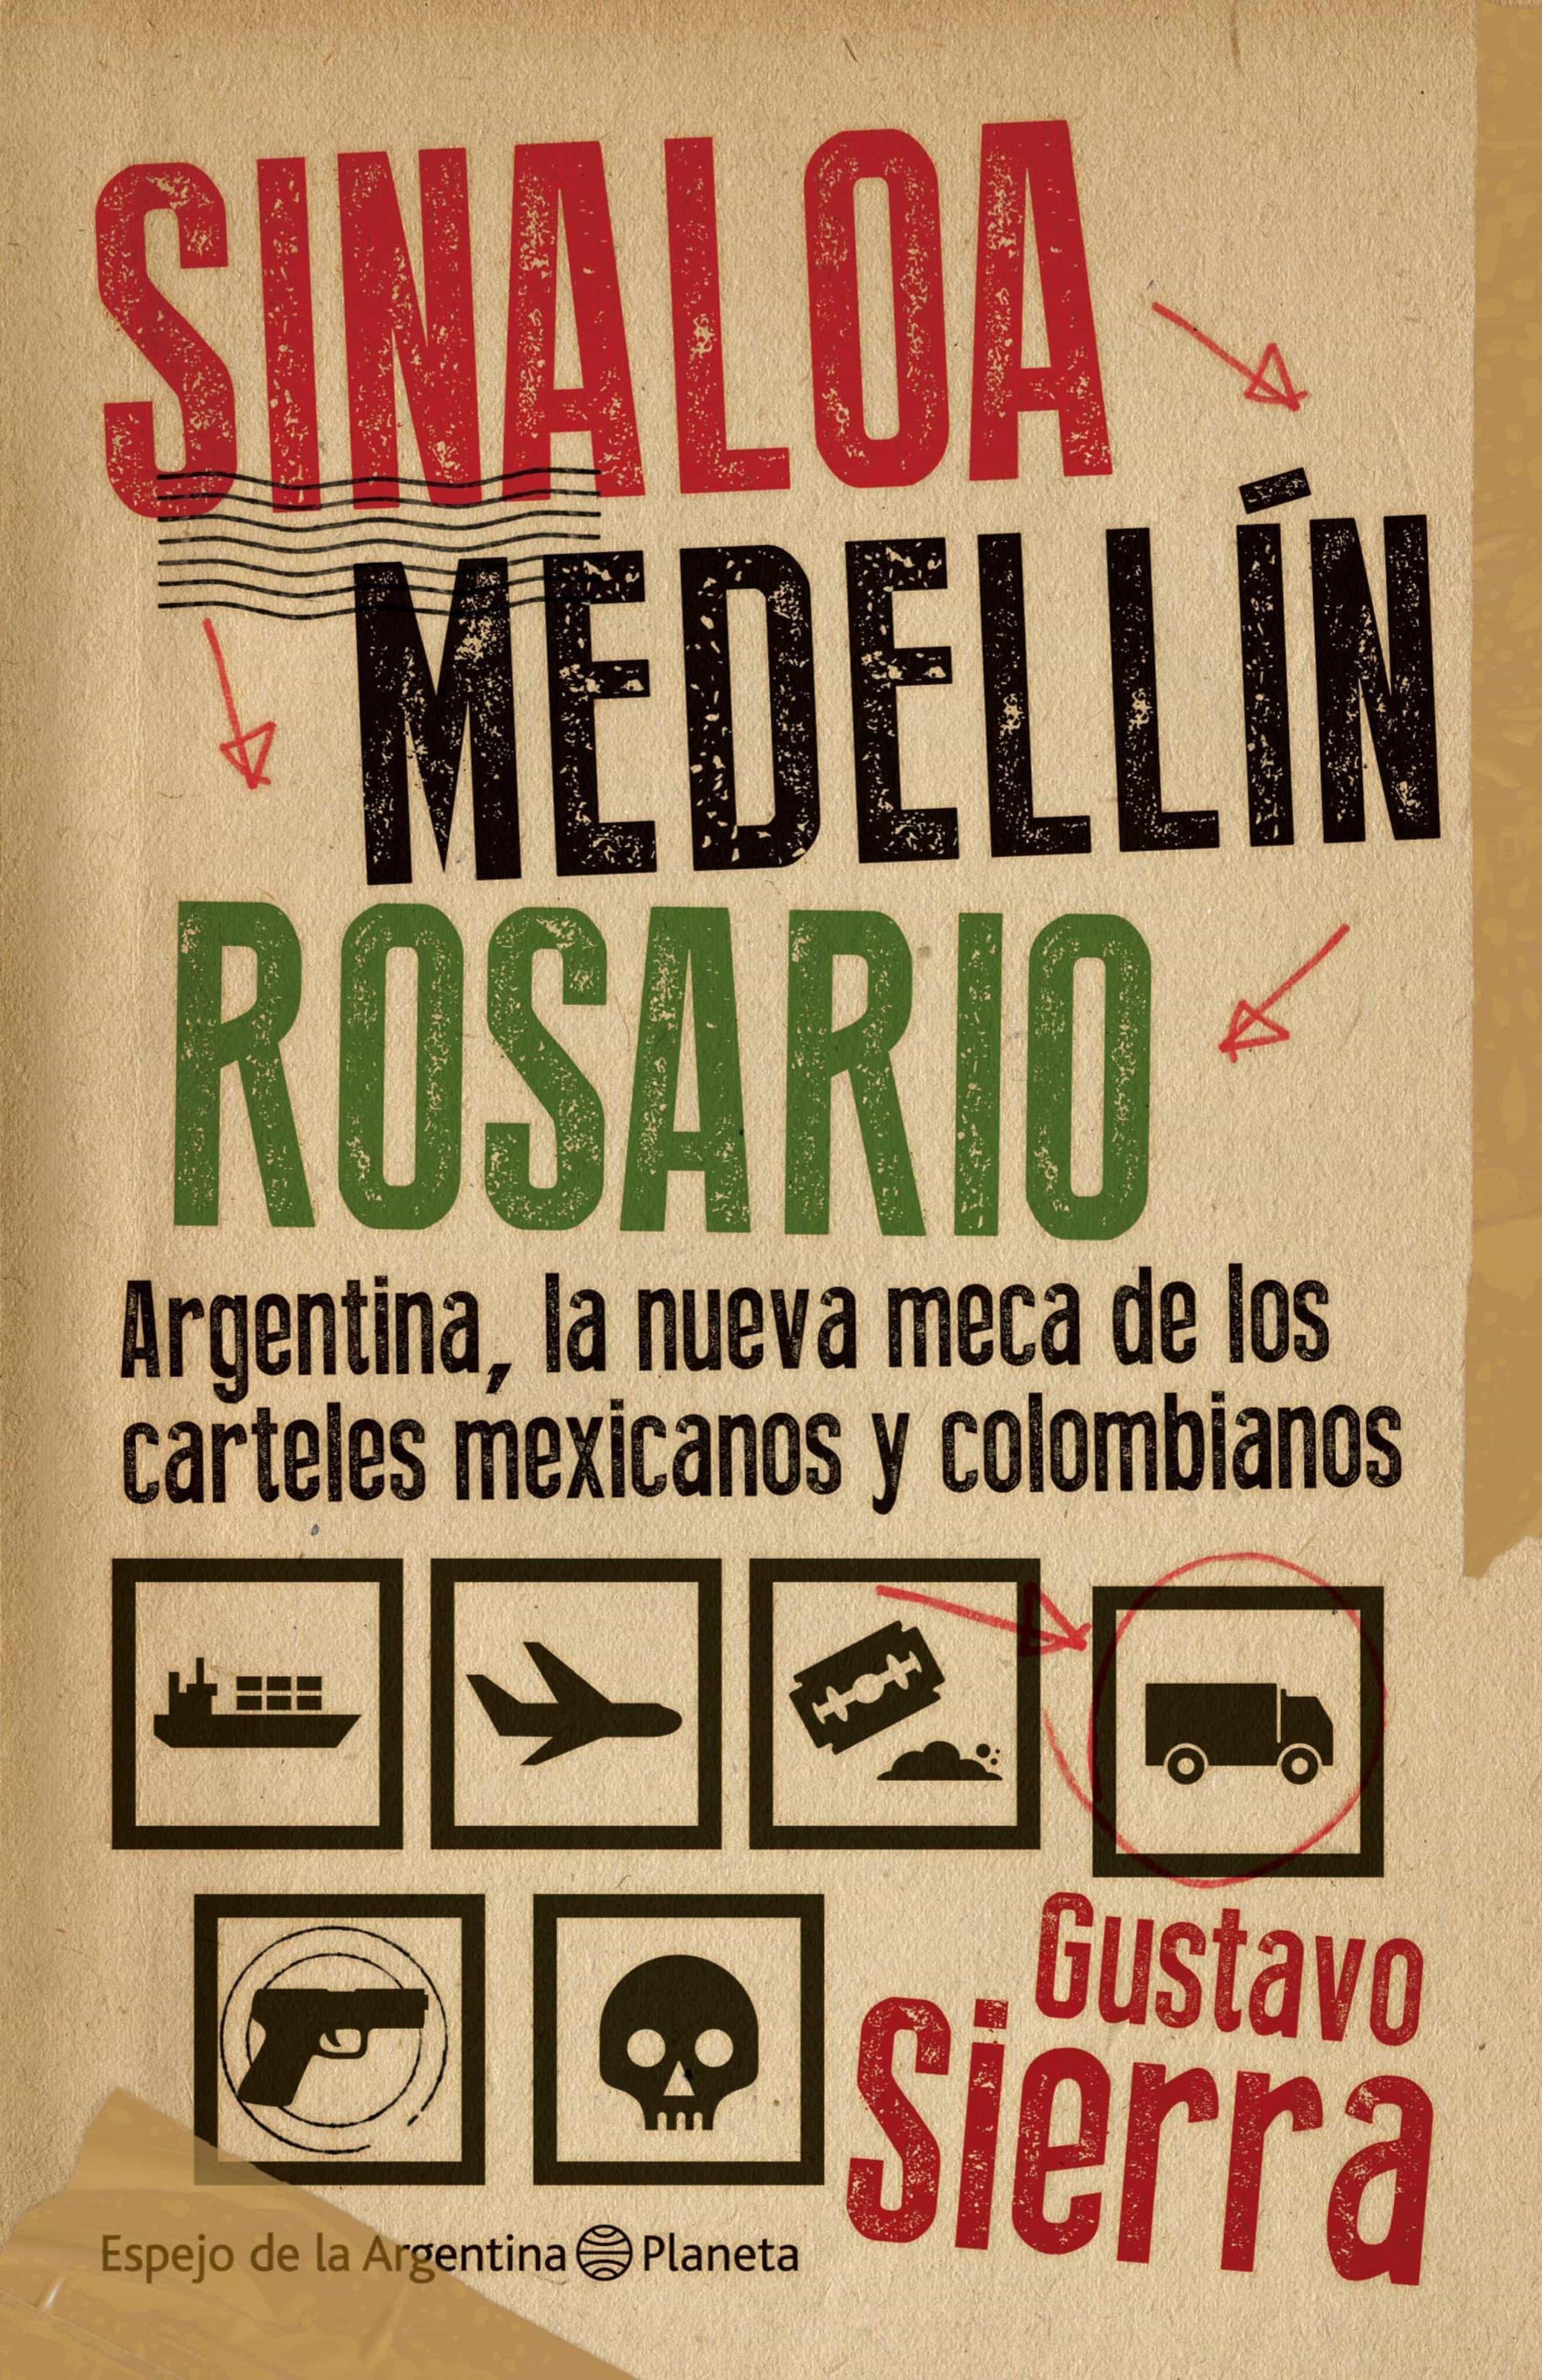 Sinaloa medellin rosario ebook gustavo sierra 9789504943358